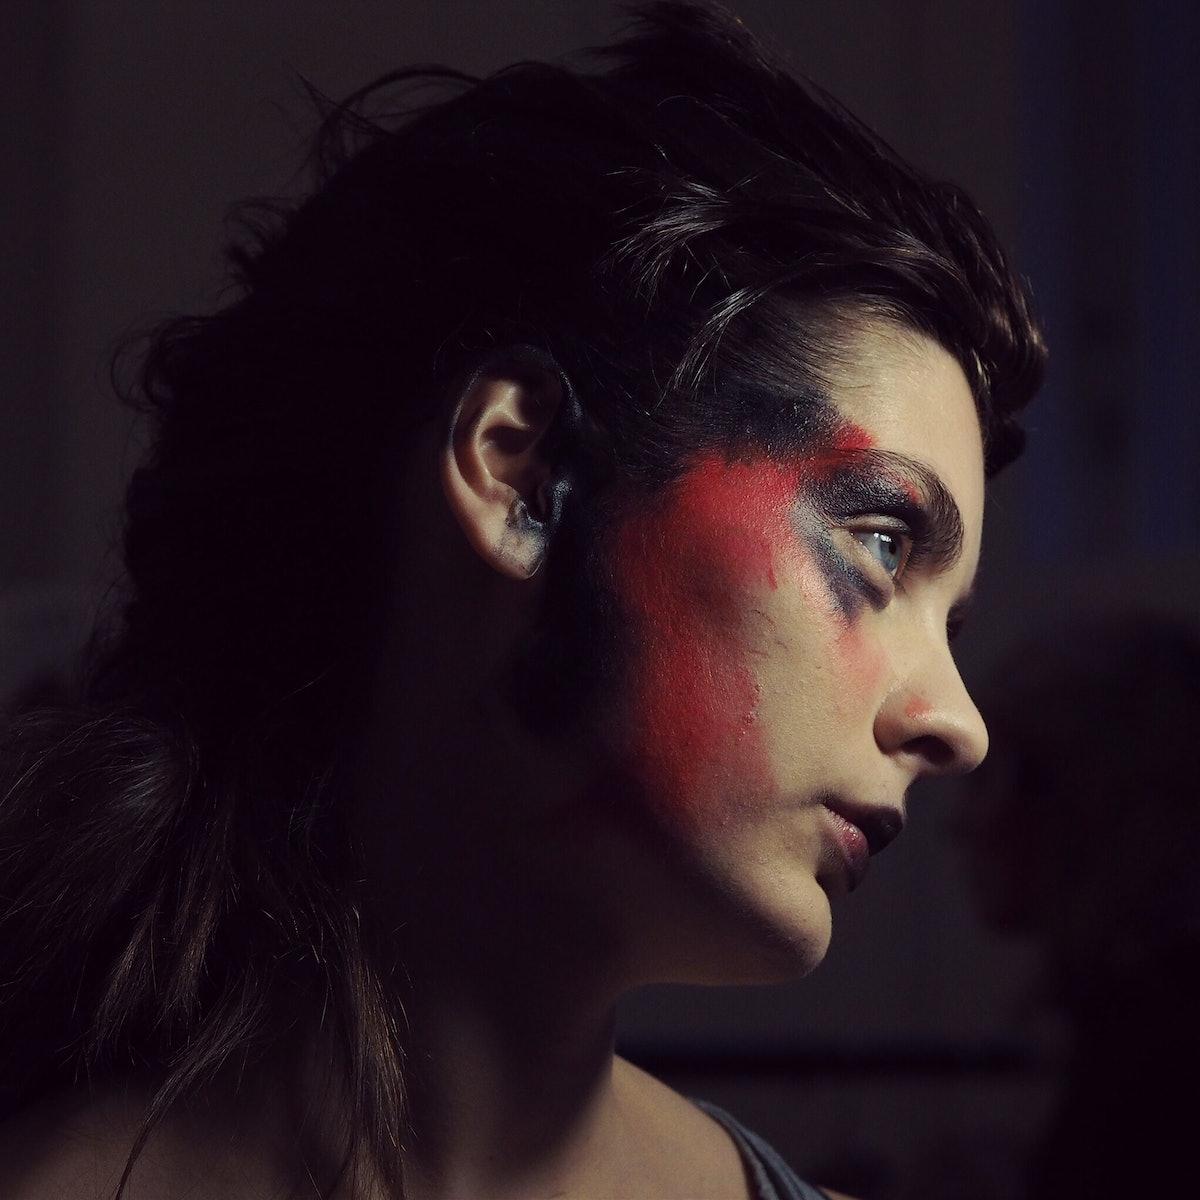 Backstage at Vivienne Westwood Fall 2015